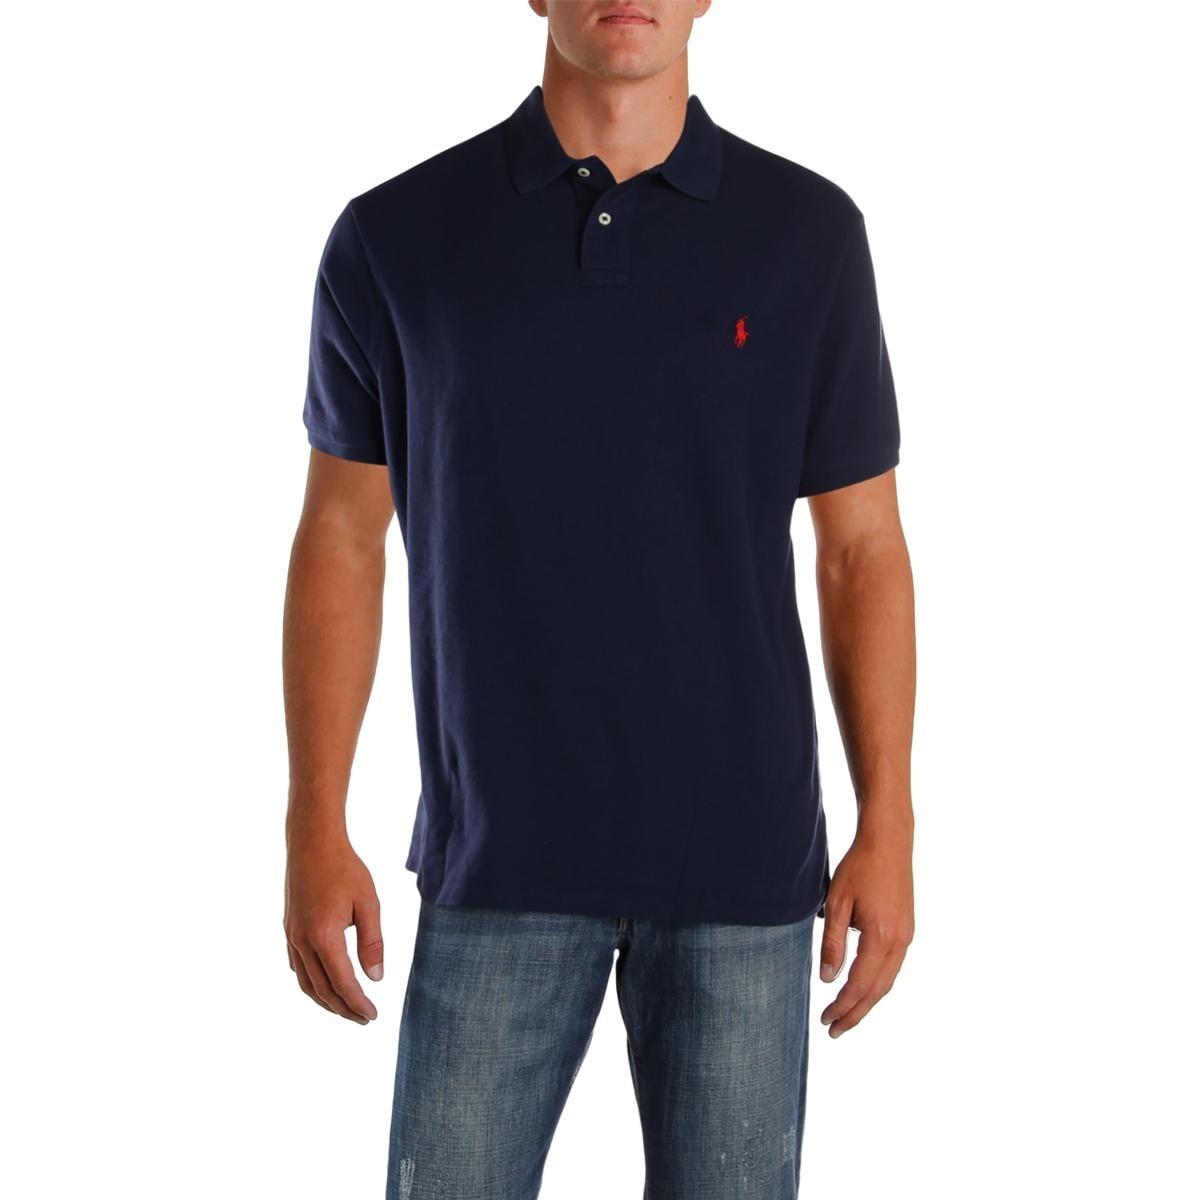 Shop Polo Ralph Lauren Mens Polo Shirt Slim Fit Mesh Xxl Free